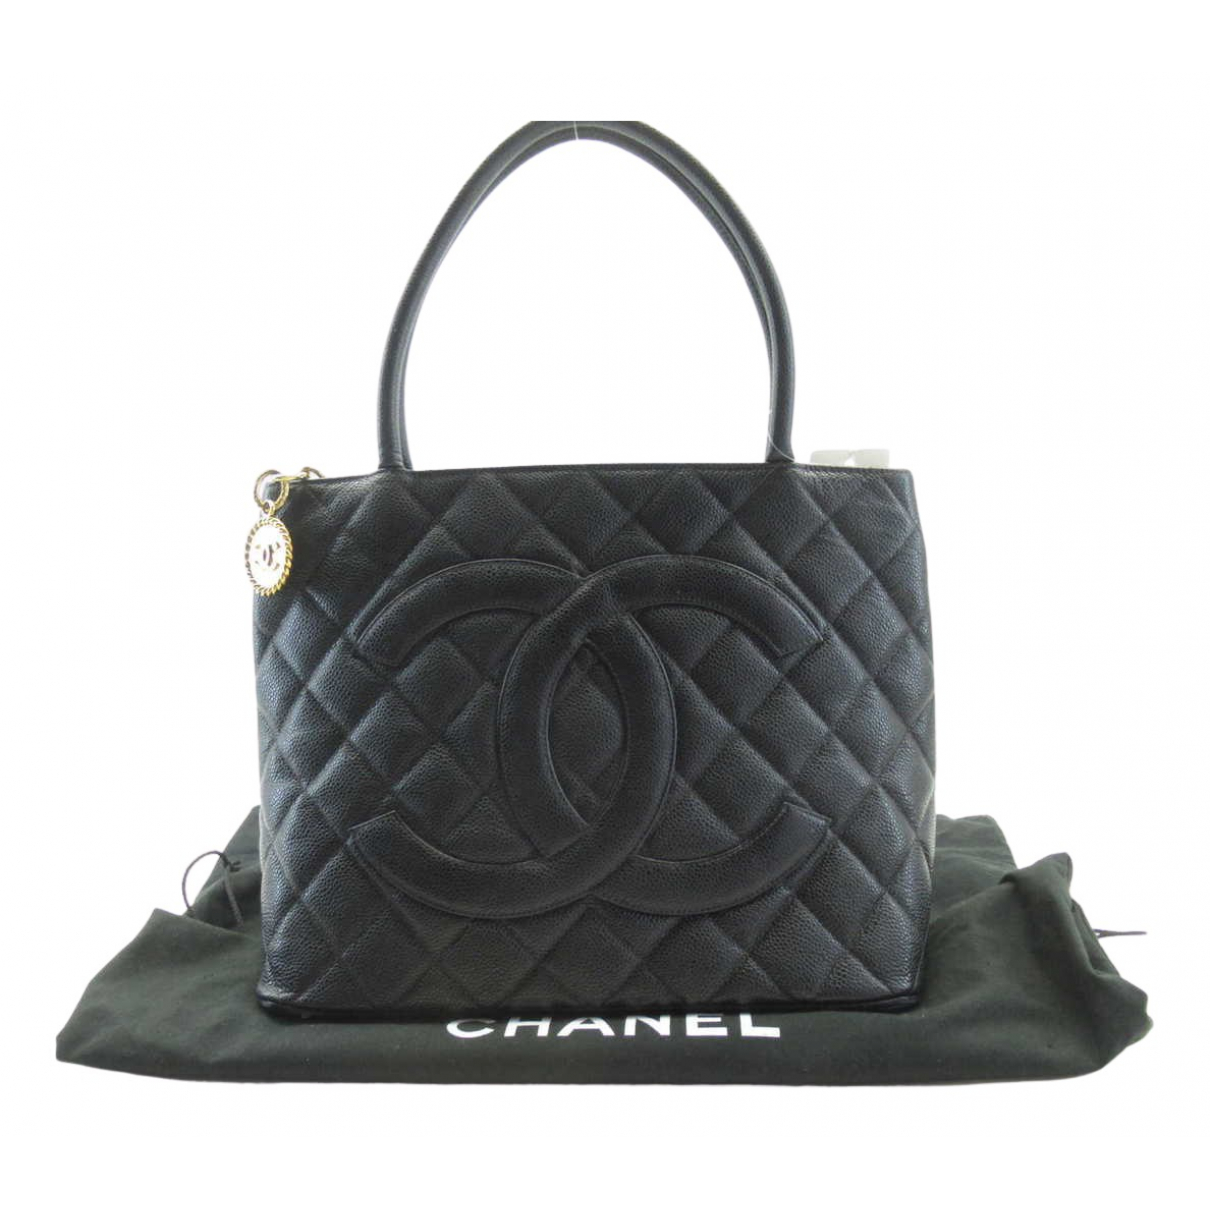 Chanel - Sac a main Medaillon pour femme en cuir - noir